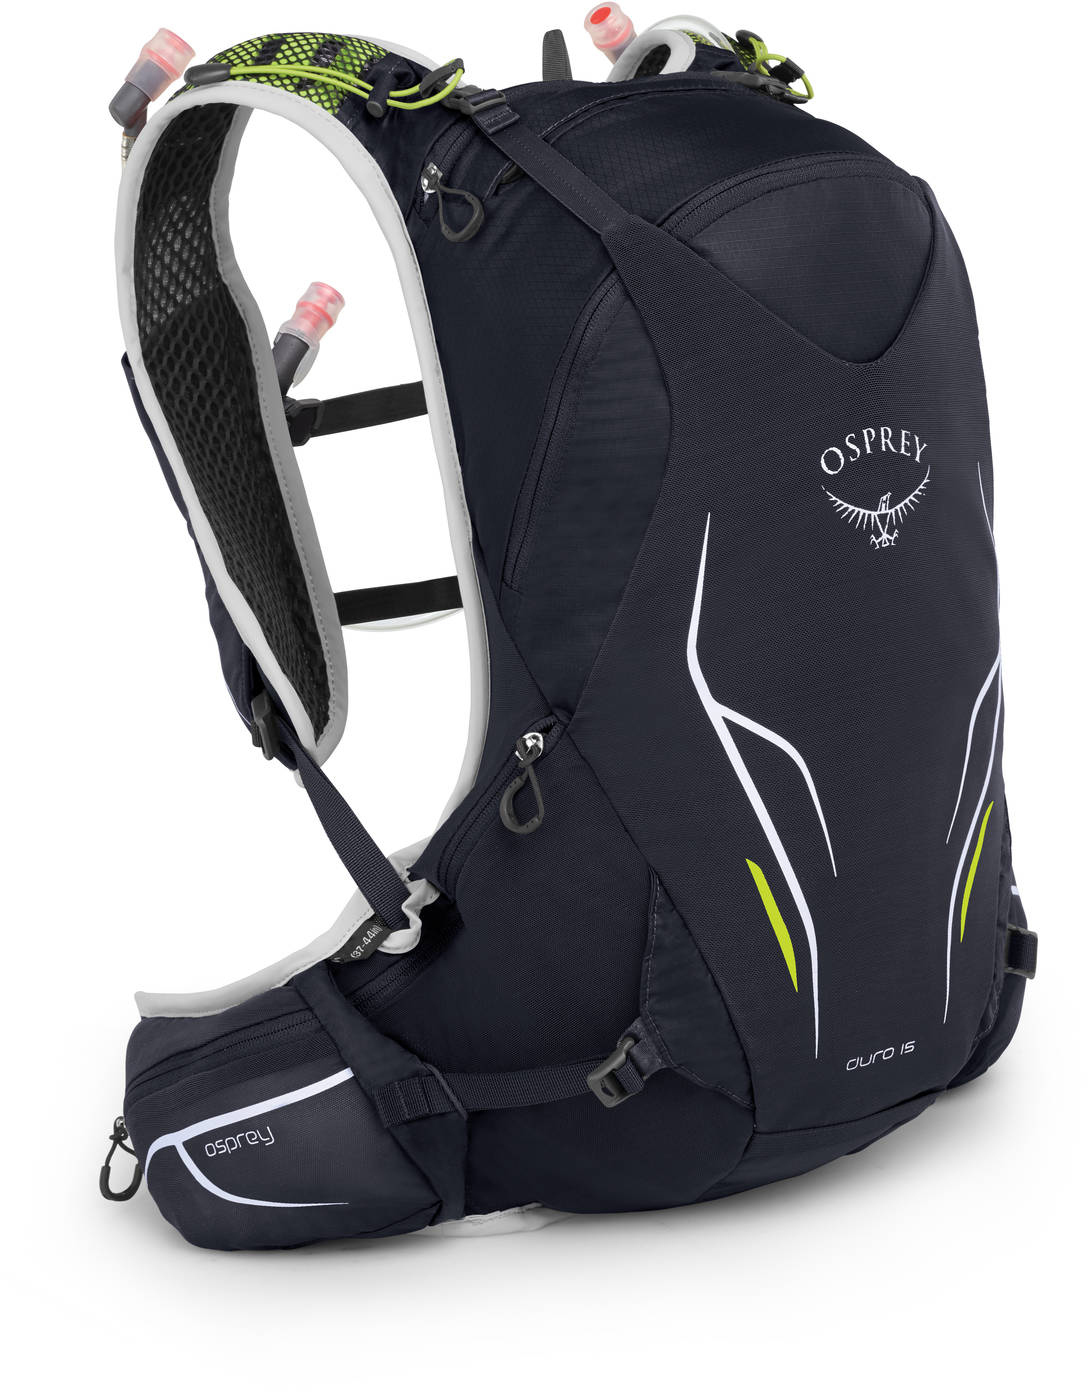 Рюкзаки для бега Рюкзак для бега Osprey Duro 15 Alpine Black Duro_15_S19_Side_Alpine_Black_web.jpg